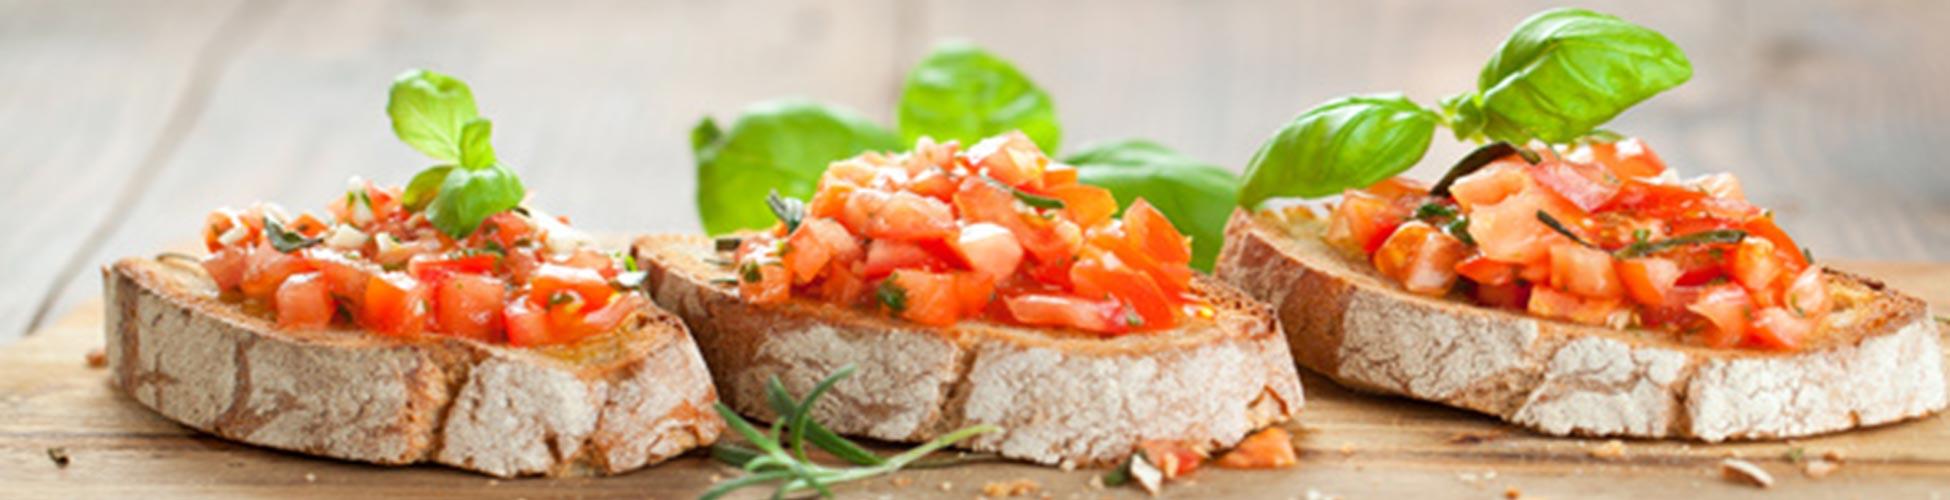 Nudelsalat mit Pesto, getrockneten Tomaten & Rucola · Zia Franca -  italienische Kochboxen